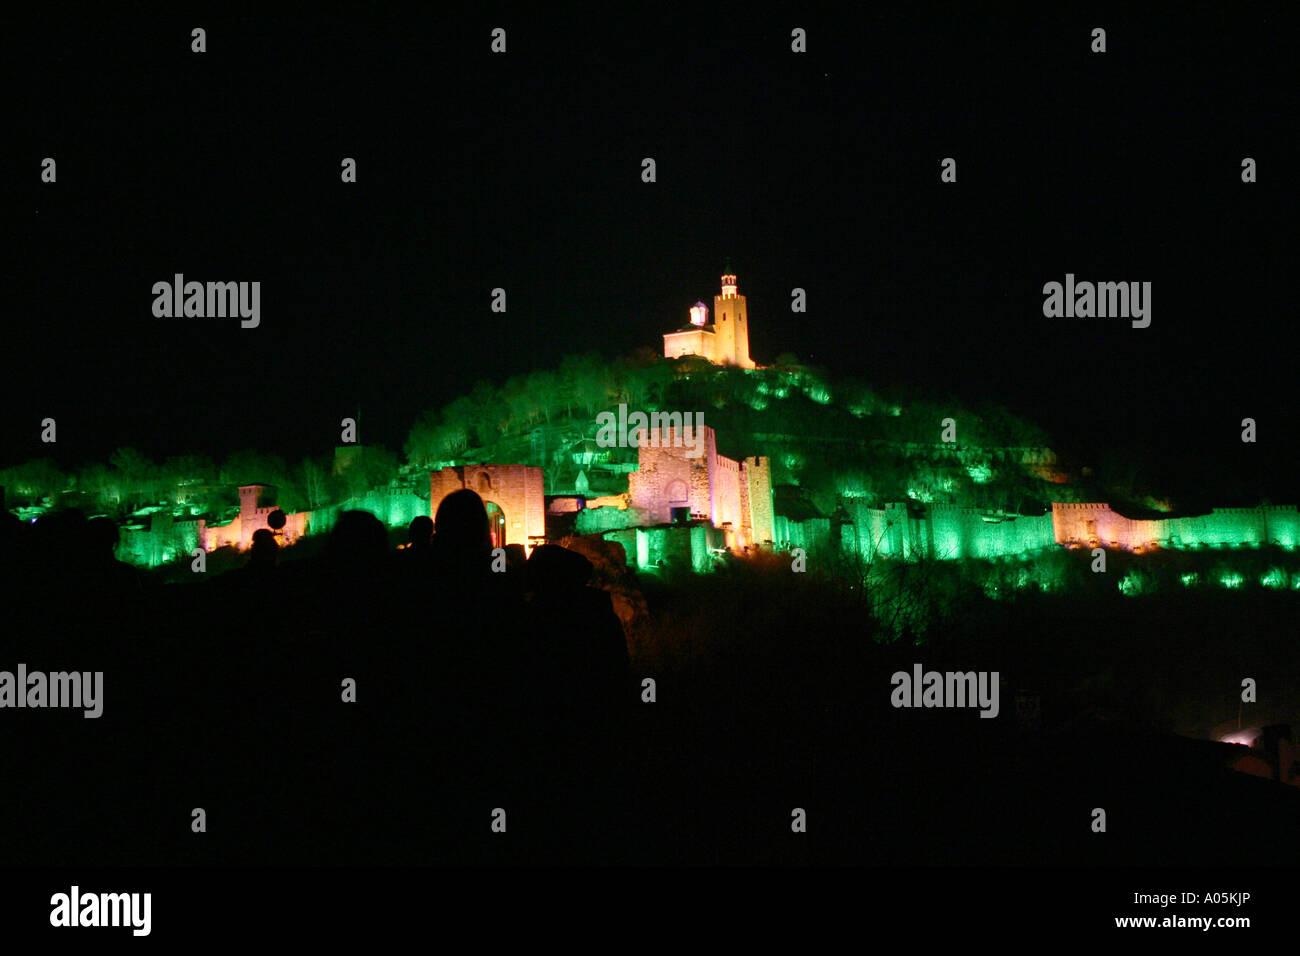 Bulgaria Veliko Tarnovo Carevec the old town luminous feast - Stock Image